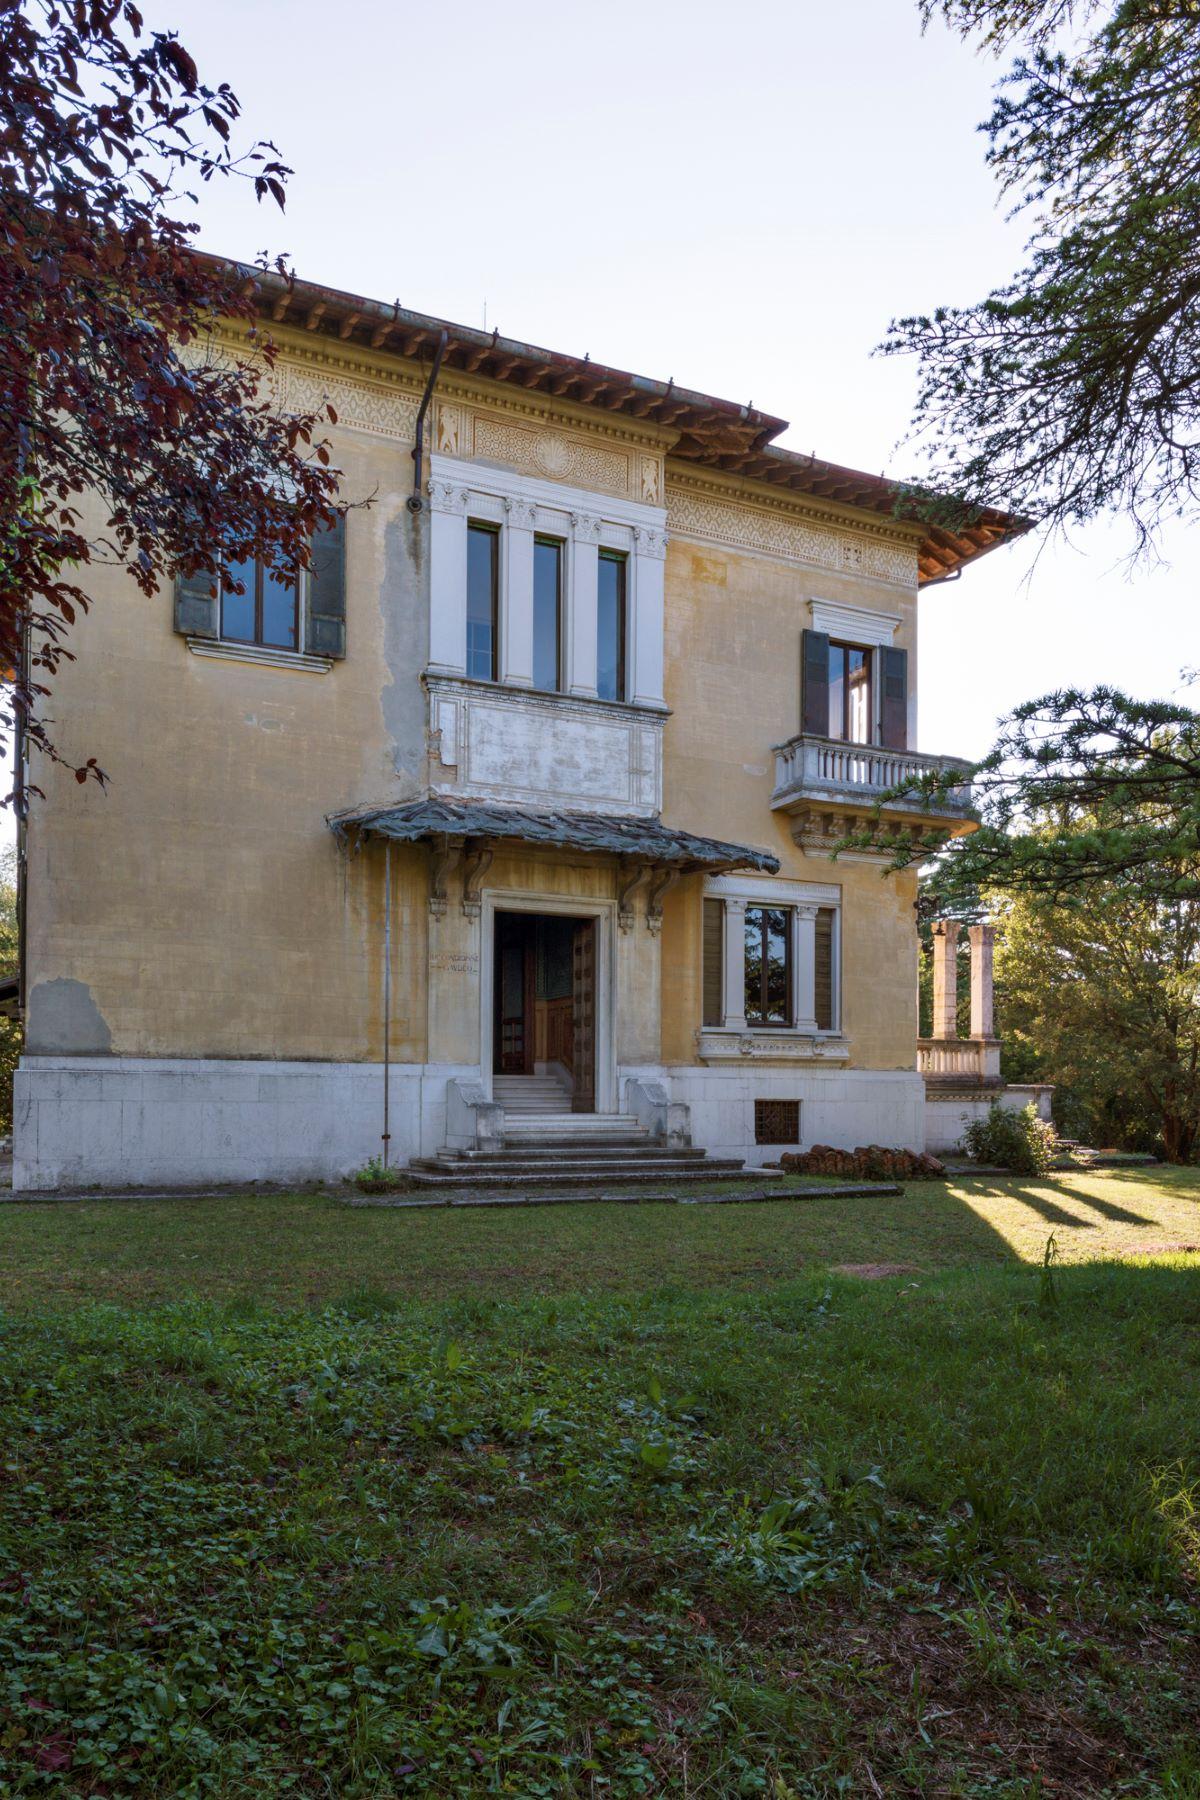 Additional photo for property listing at Beautiful Art Nouveau villa viale 1° Maggio Salsomaggiore Terme, Parma 43125 Italie